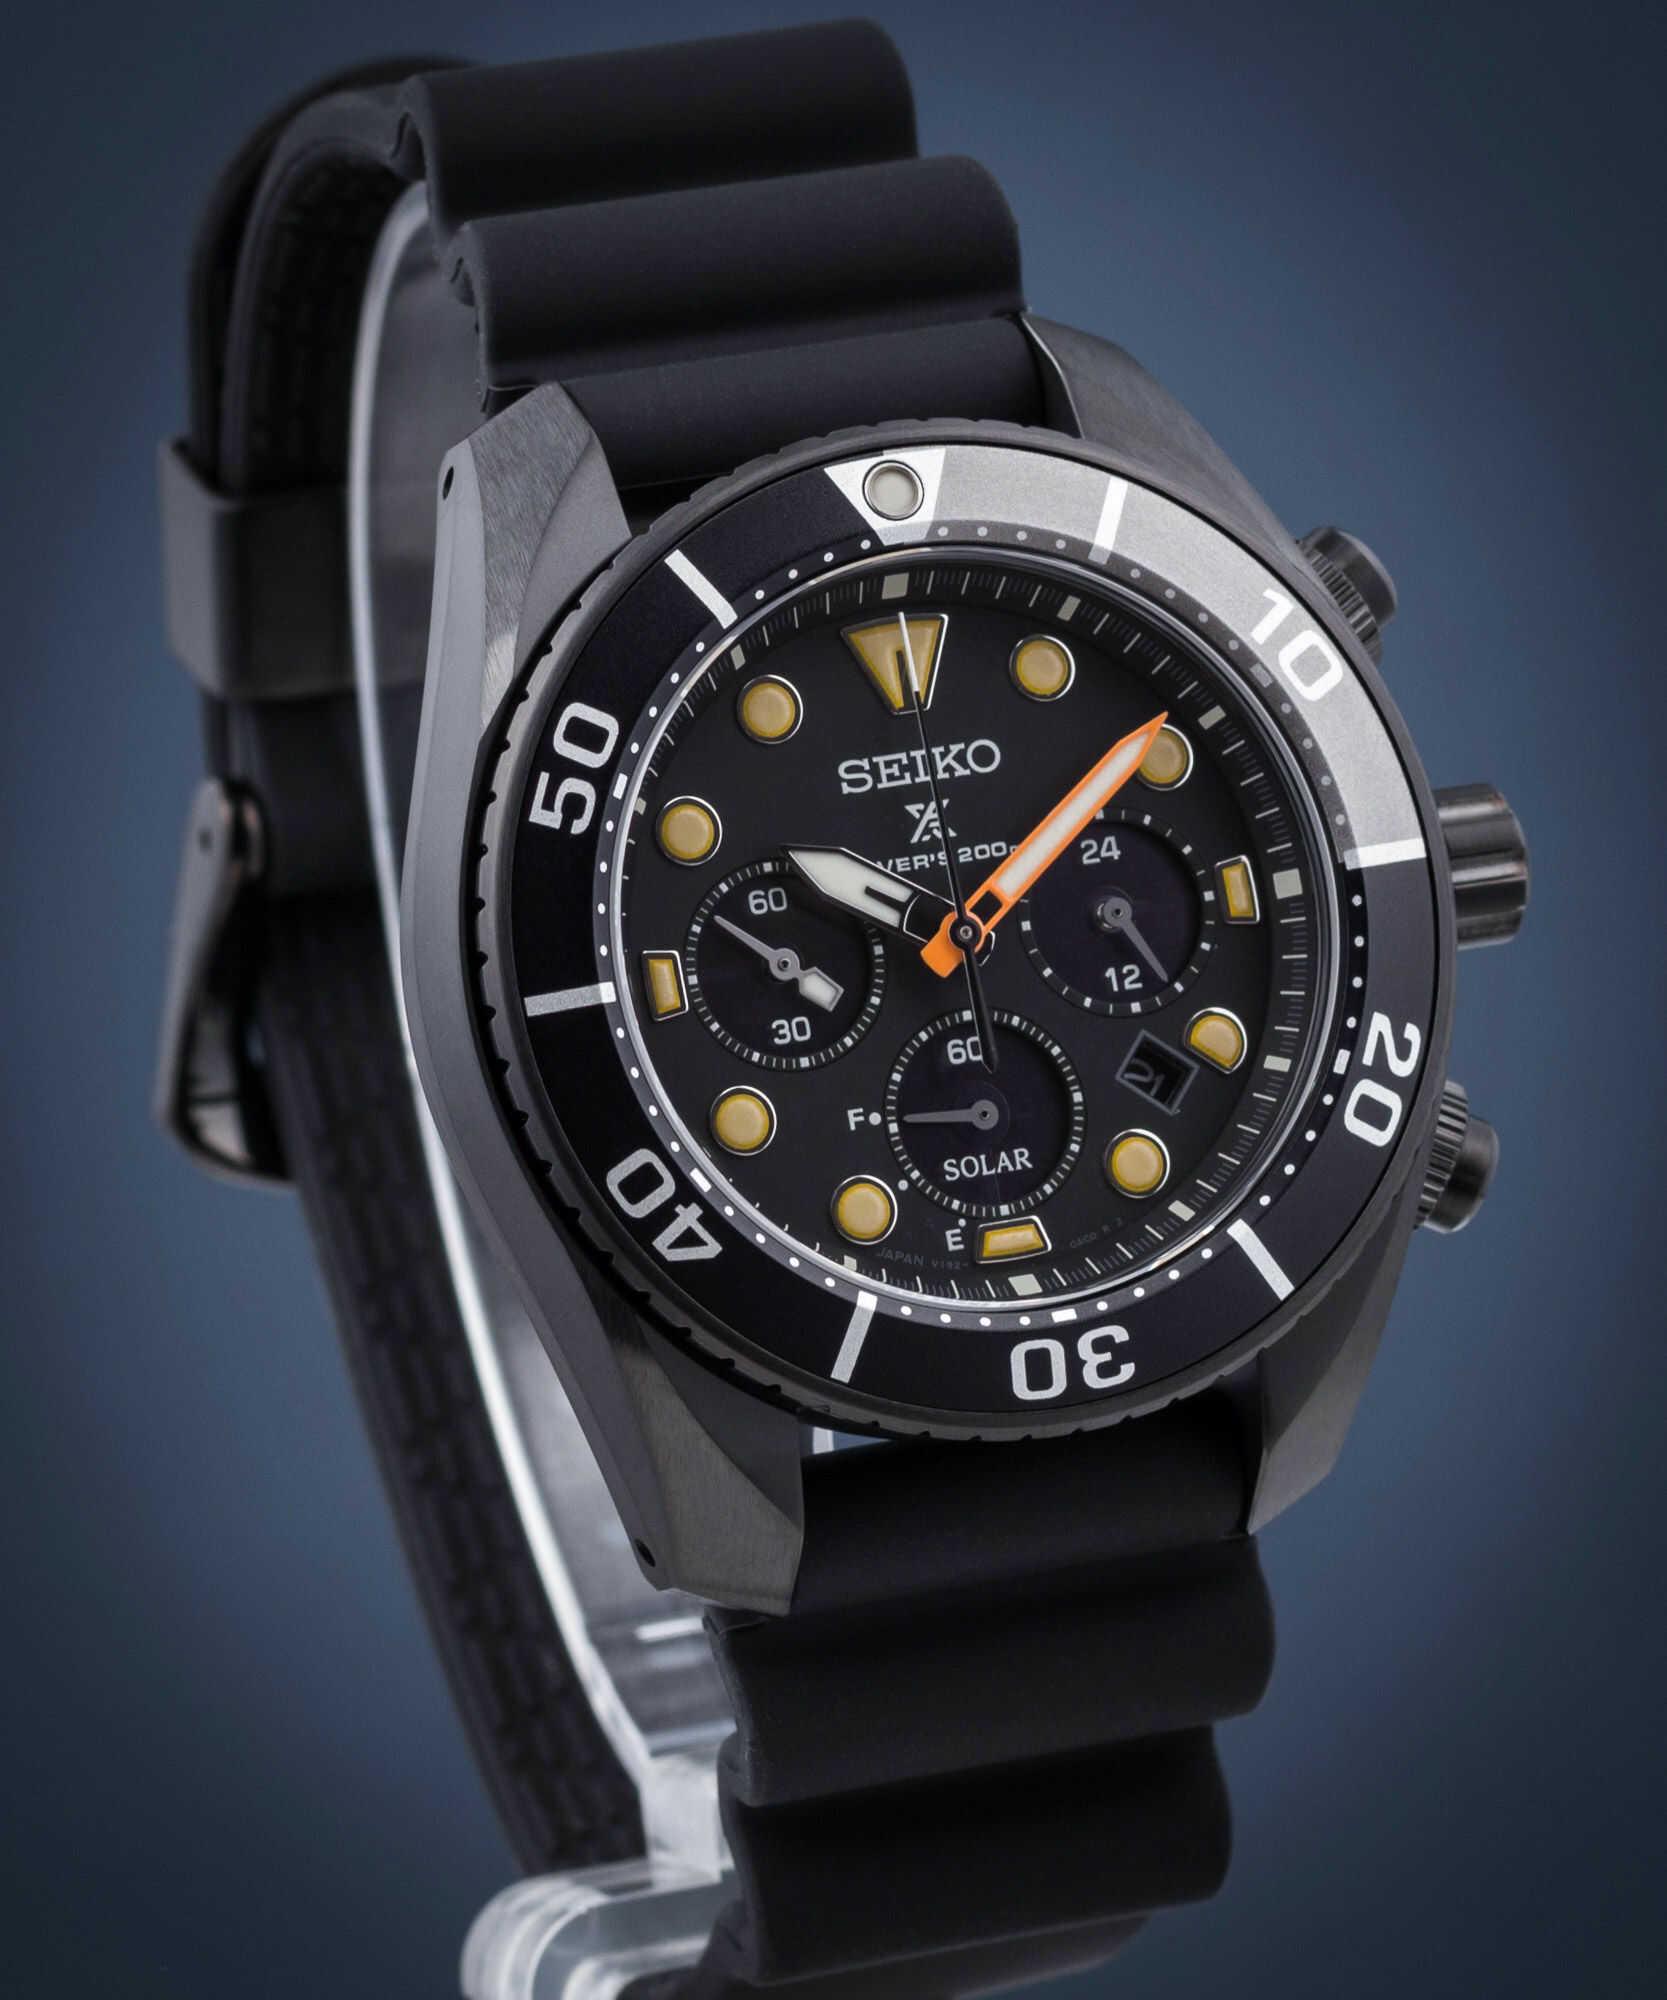 Zegarek męski Seiko Prospex Black Series Limited Edition